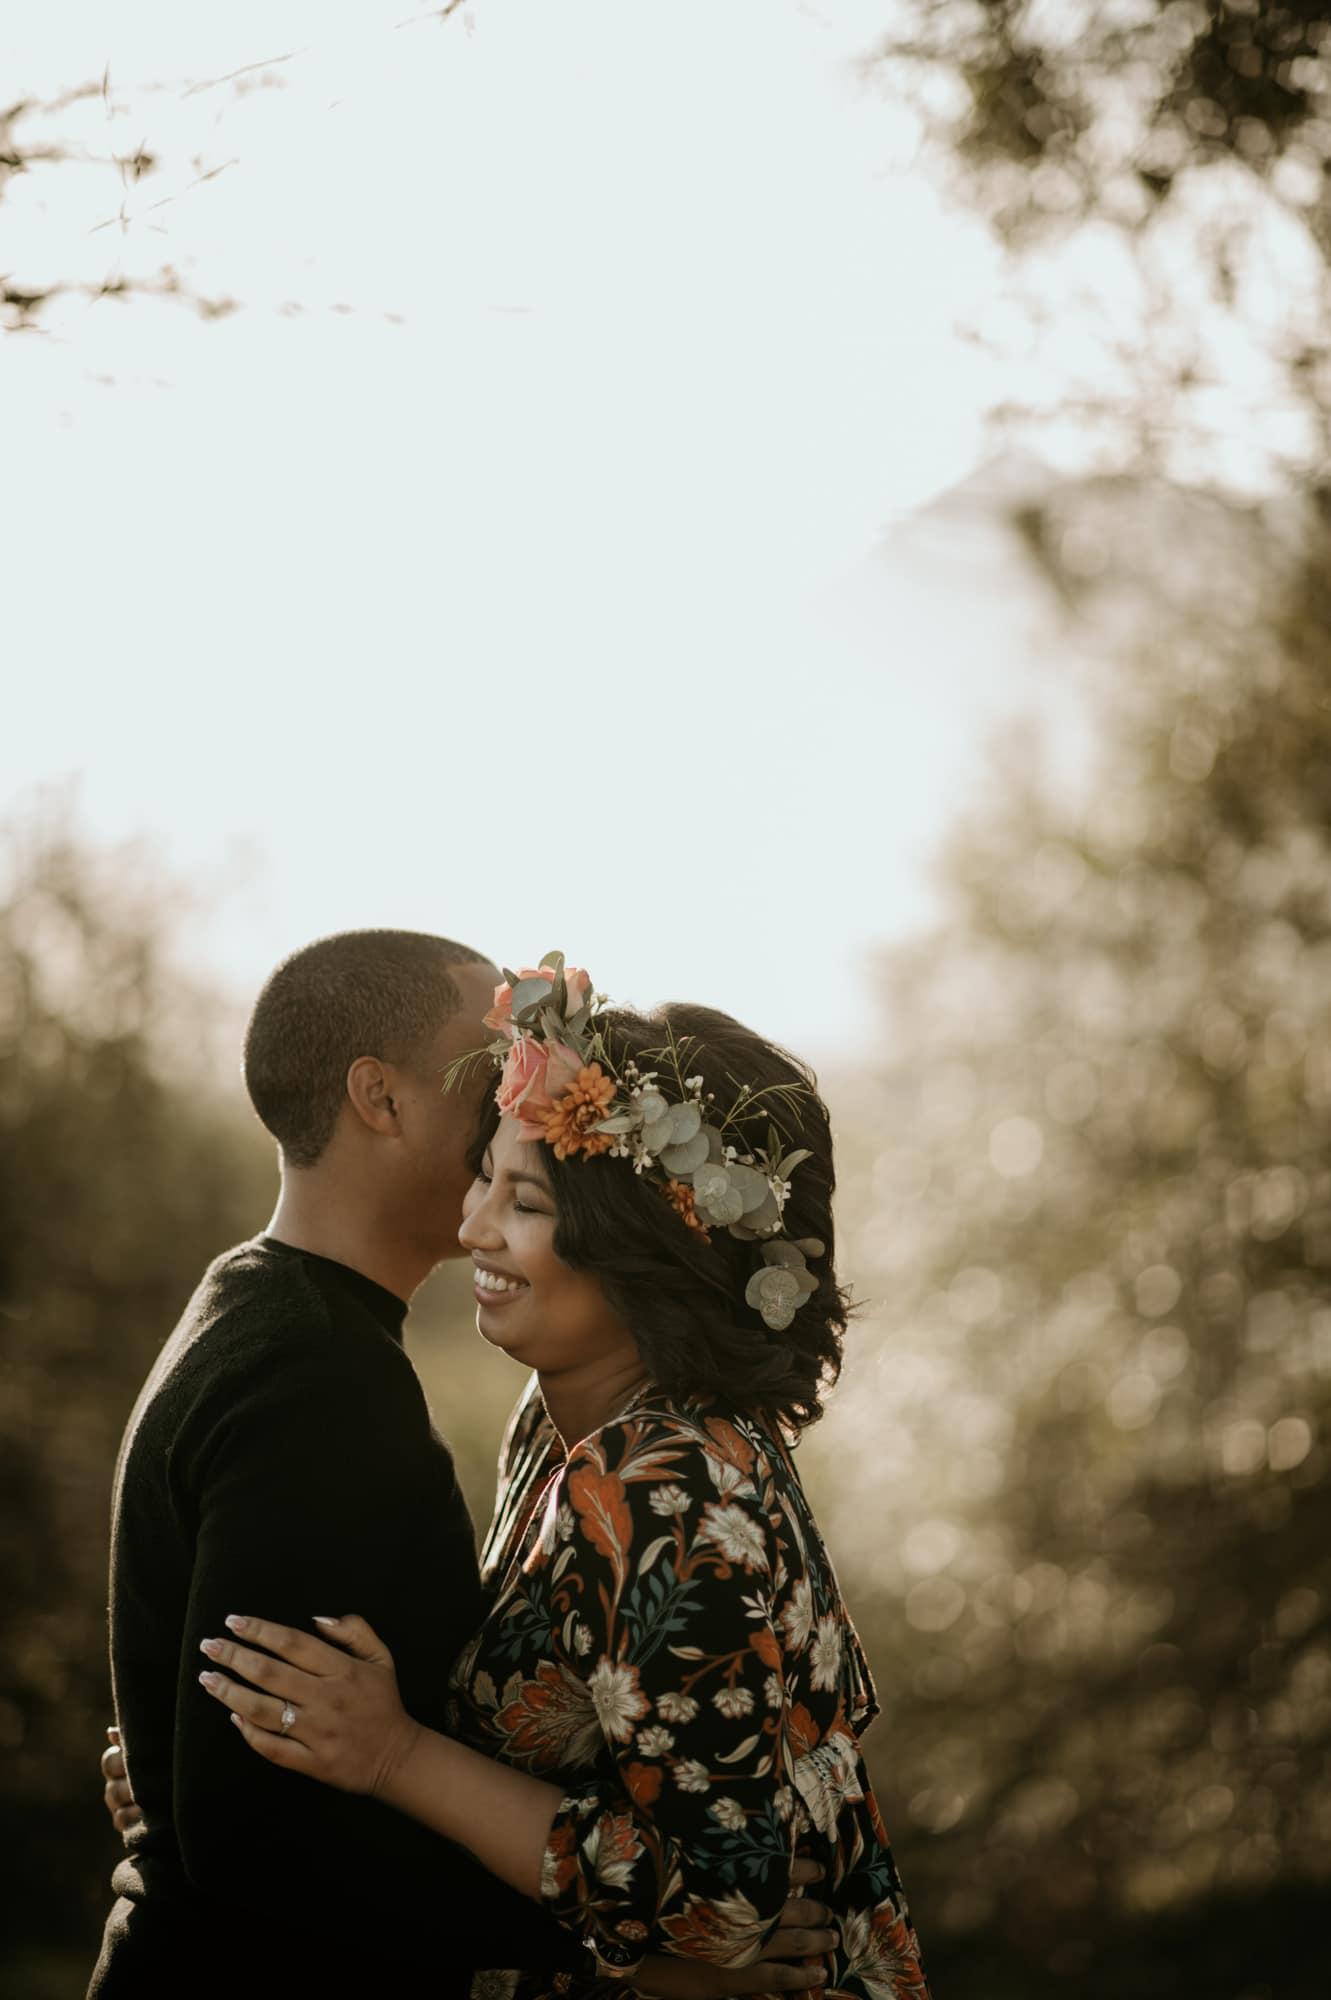 Farren-Naygene-Engagement-June-Richards-Photography-127